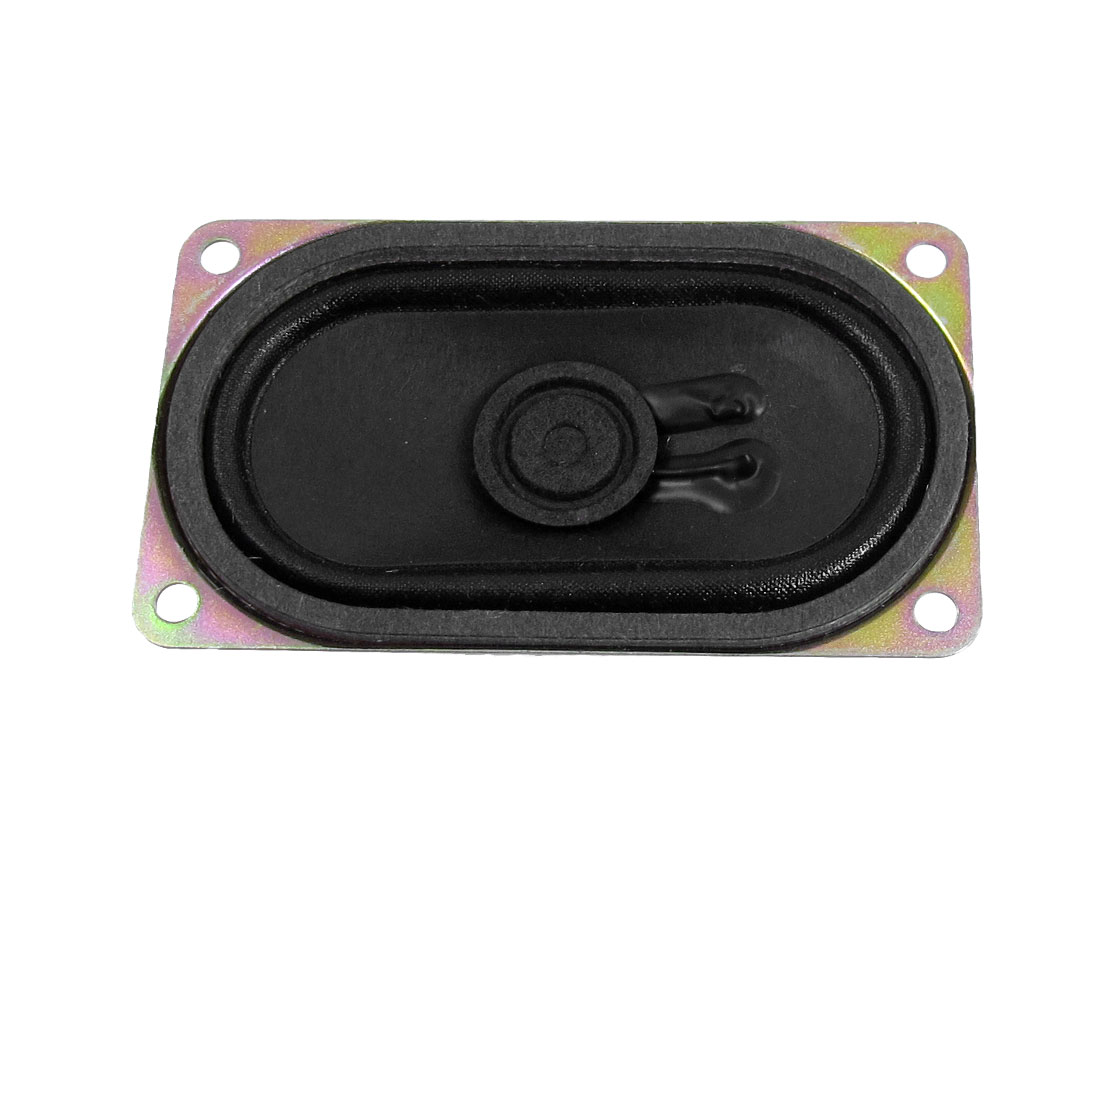 3W 4 Ohm Aluminum Housing Rectangular Internal Magnet Speaker 70mmx40mm